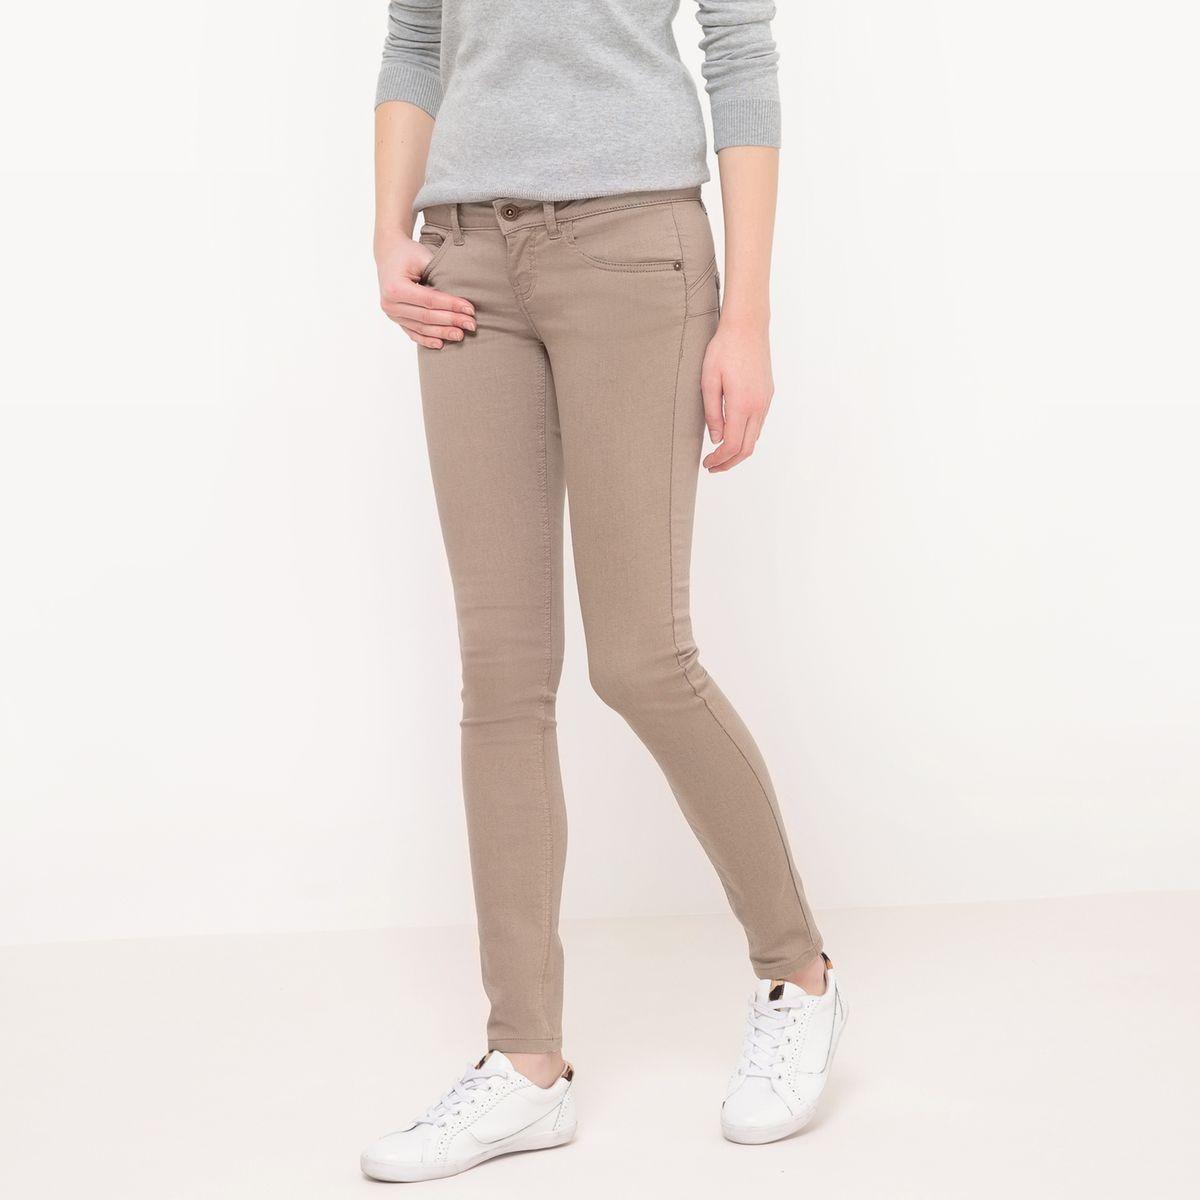 Pantalon slim, taille normale, effet push-up